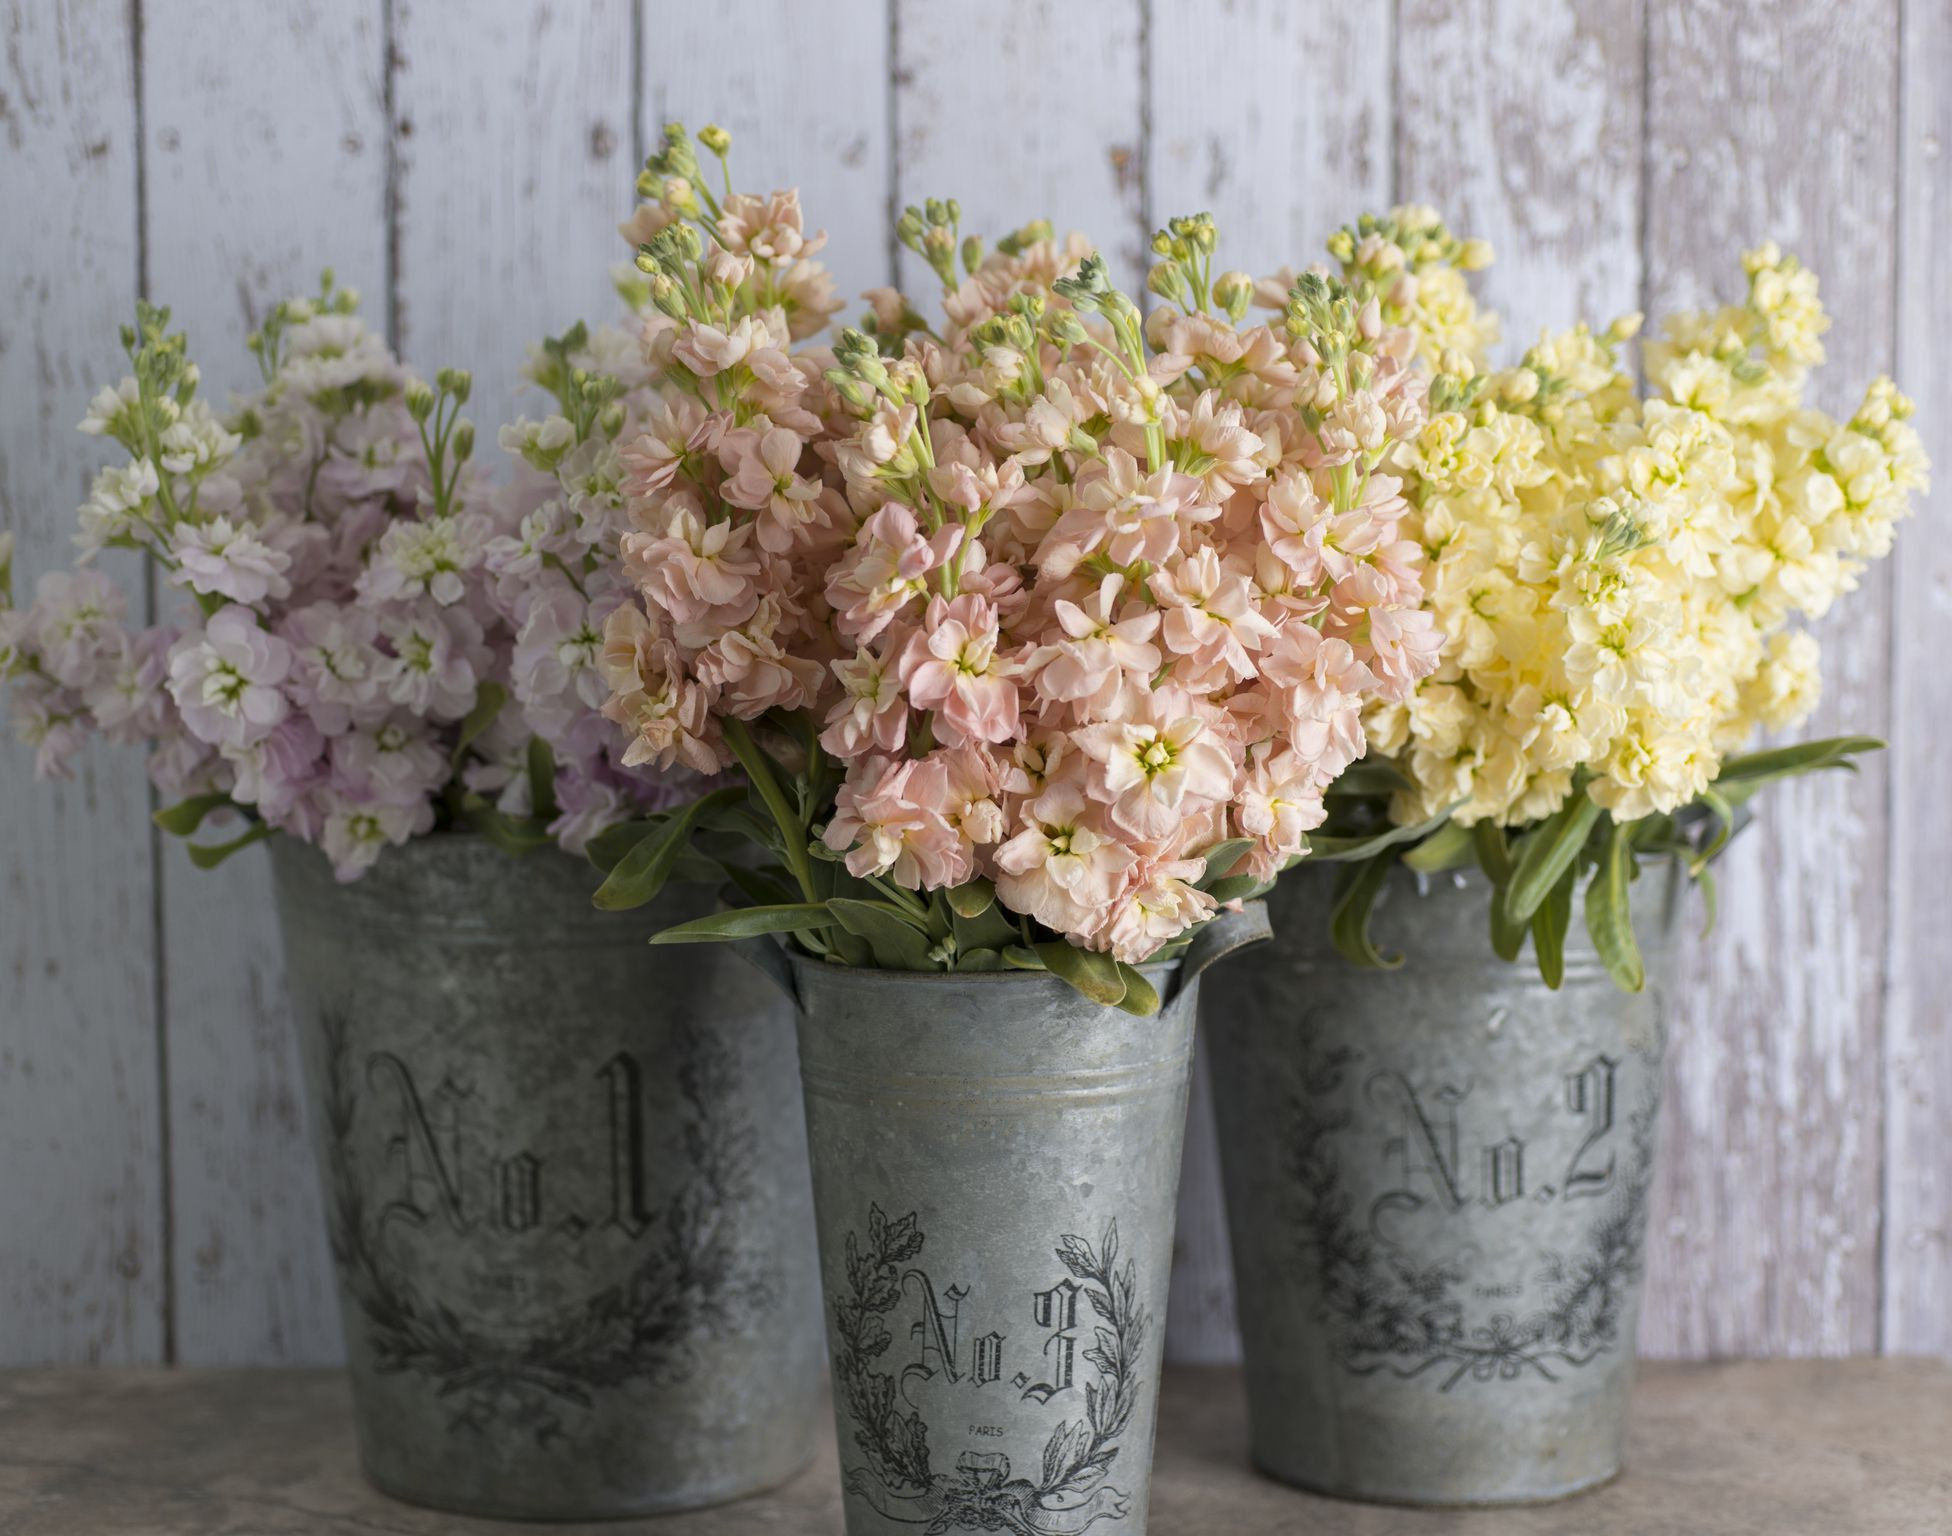 scentedstockflowers 584ae4003df78c491e0b09bf